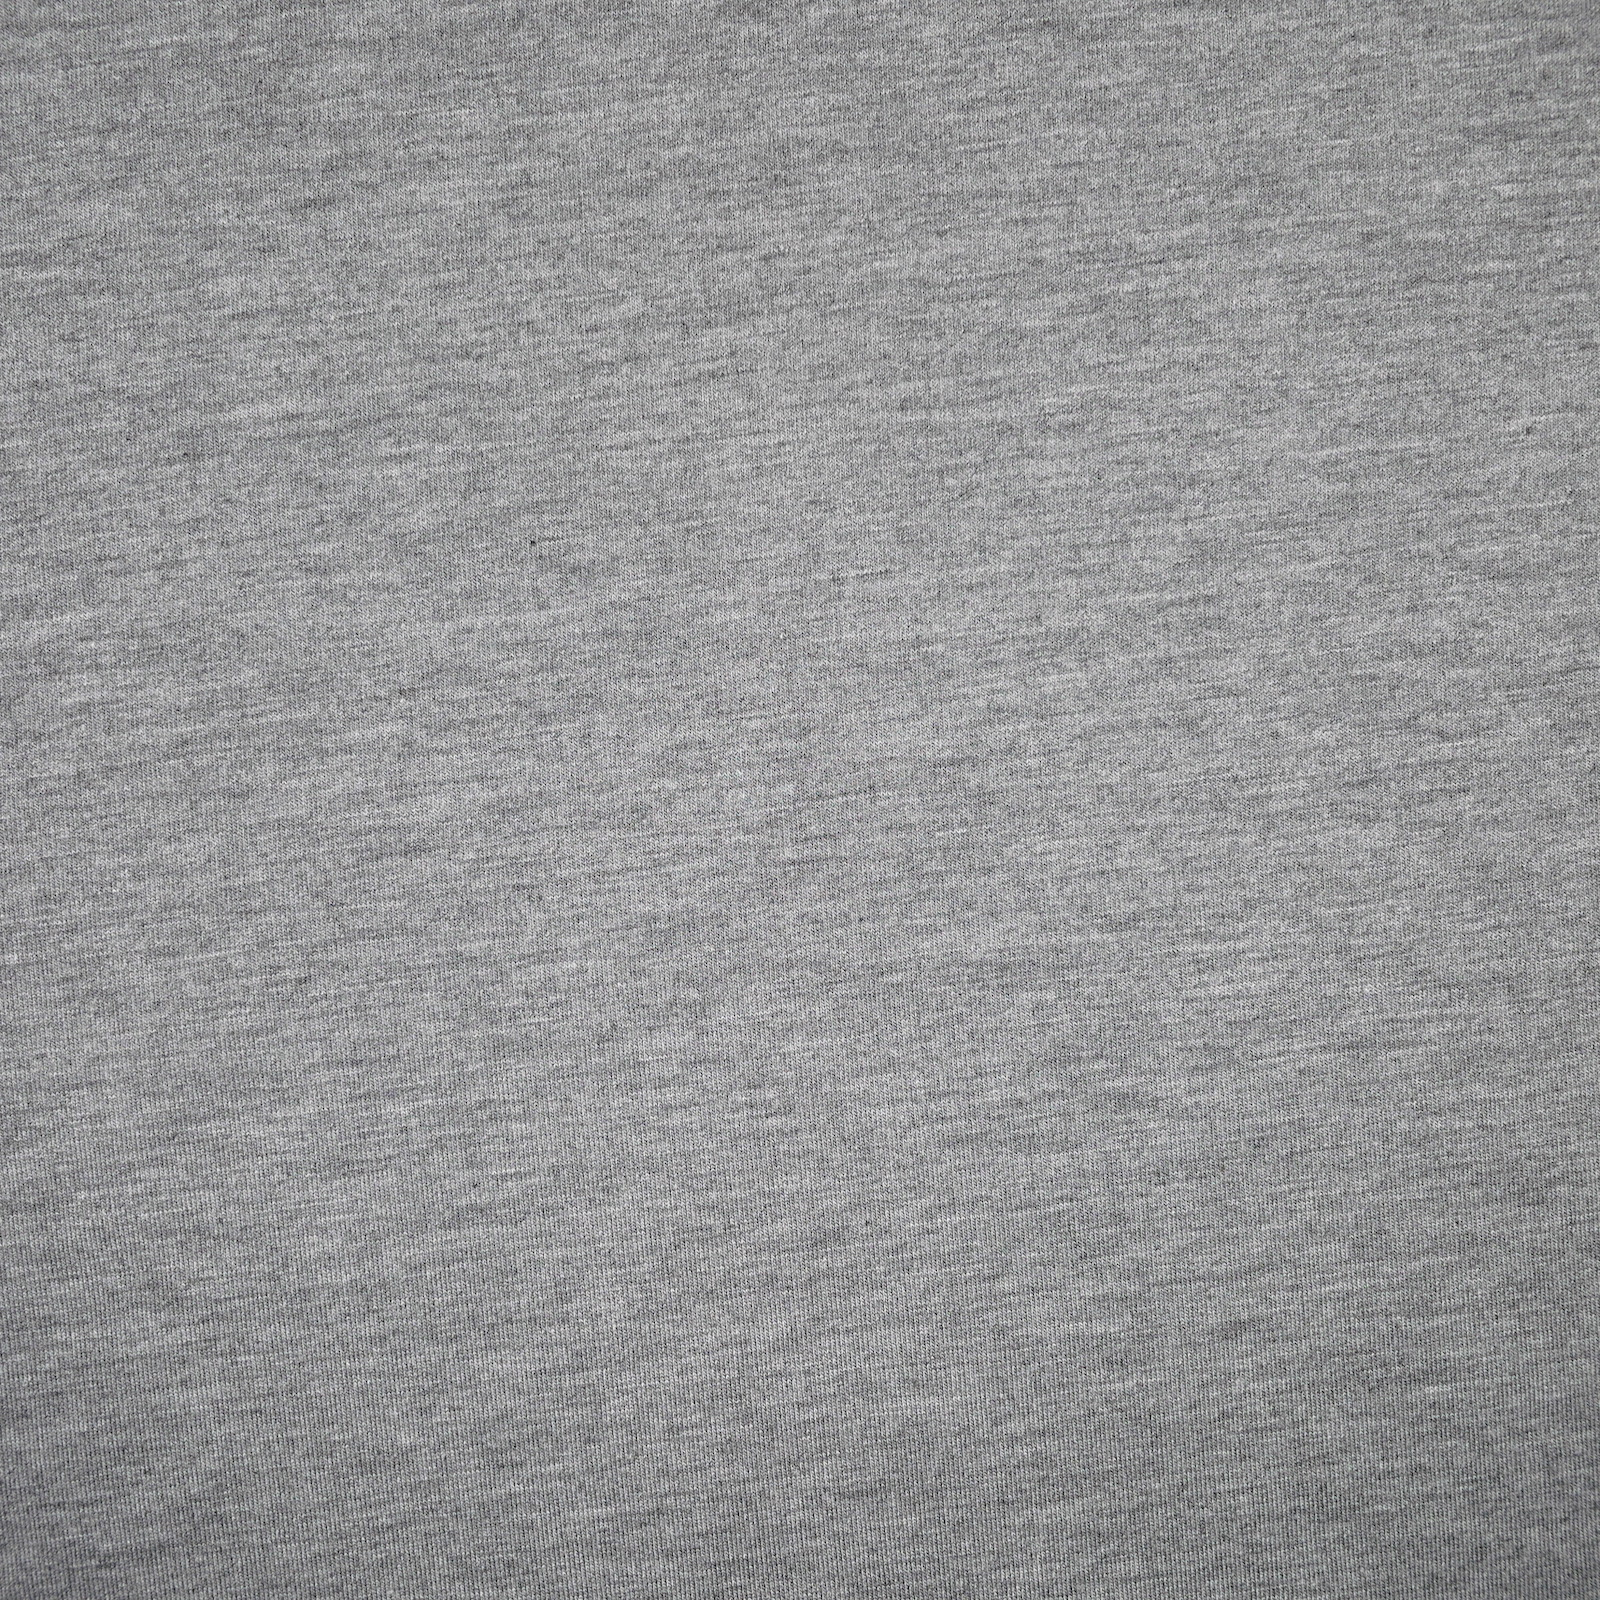 Unijersey Baumwolljersey Stoff in der Farbe grau weiß-meliert